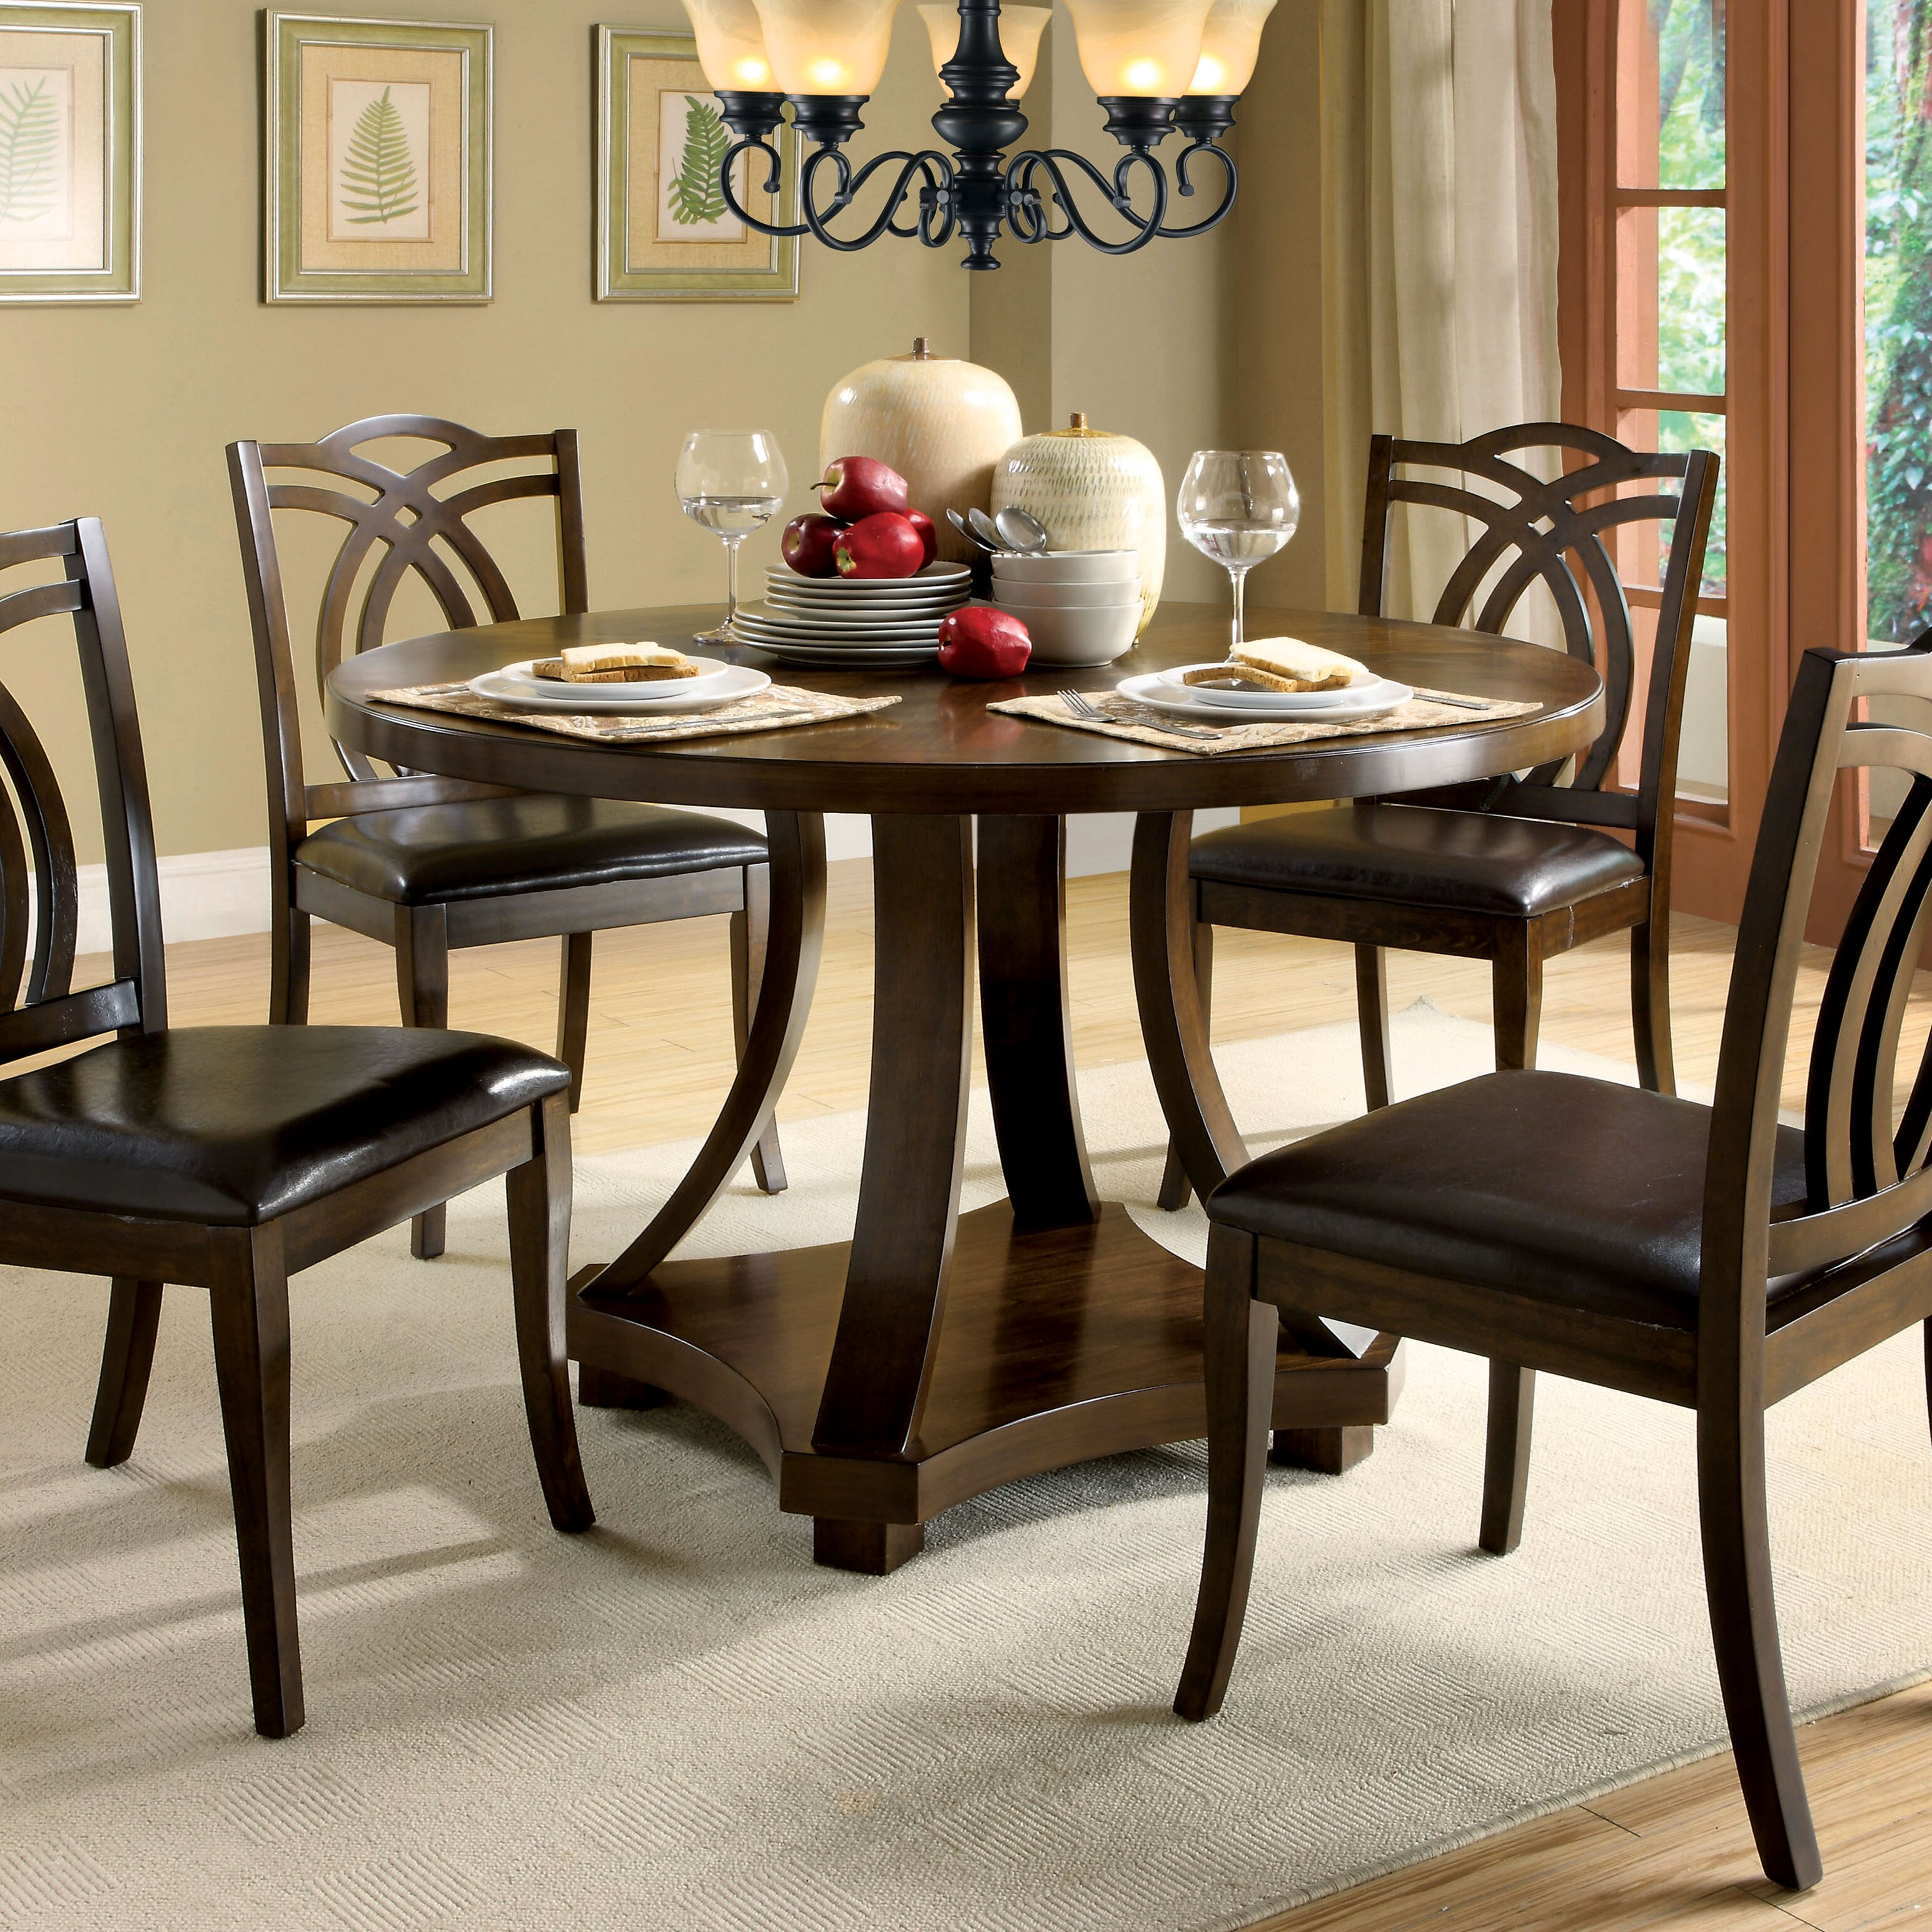 Hokku designs baldwin dining table reviews wayfair for Hokku designs dining room furniture